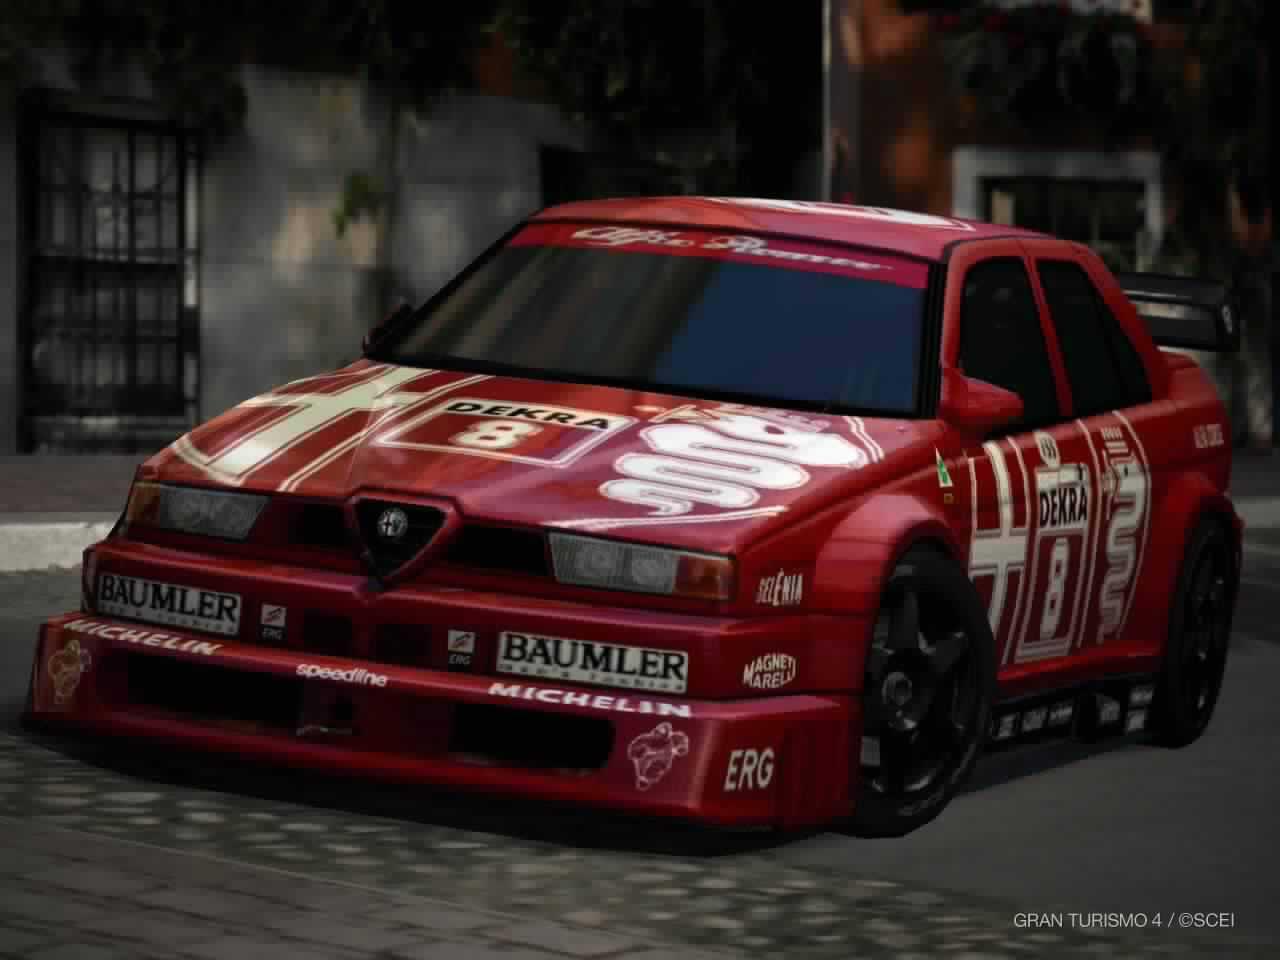 Alfa Romeo Giulia Wiki >> Alfa Romeo 155 2.5 V6 TI '93 | Gran Turismo Wiki | FANDOM powered by Wikia